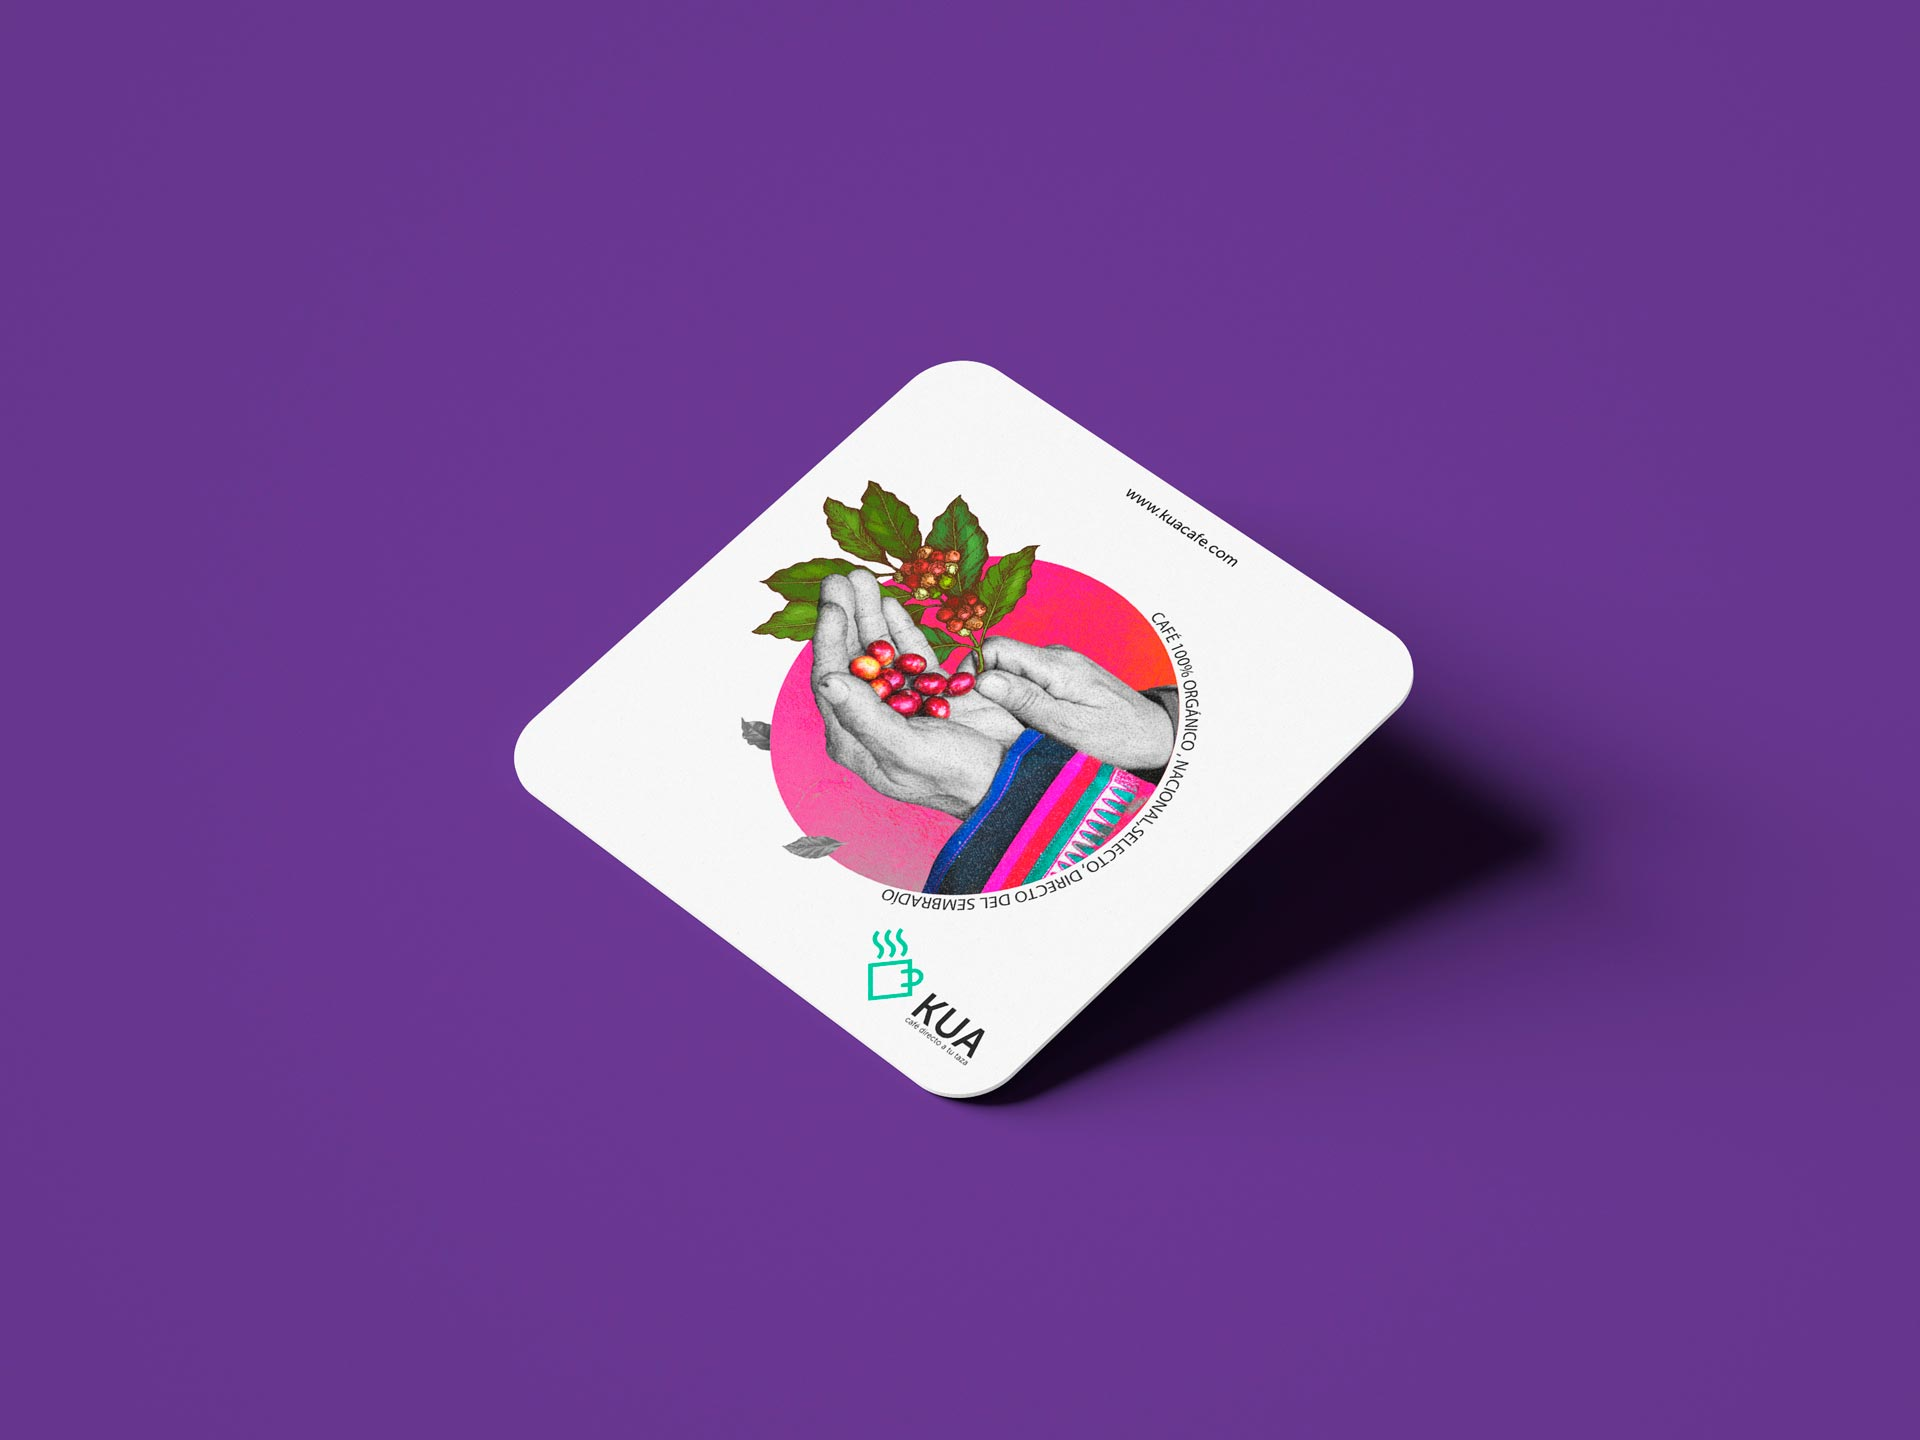 boom-agencia-marketing-digital-branding-kua-cafe-tienda-online-collage-portavasos